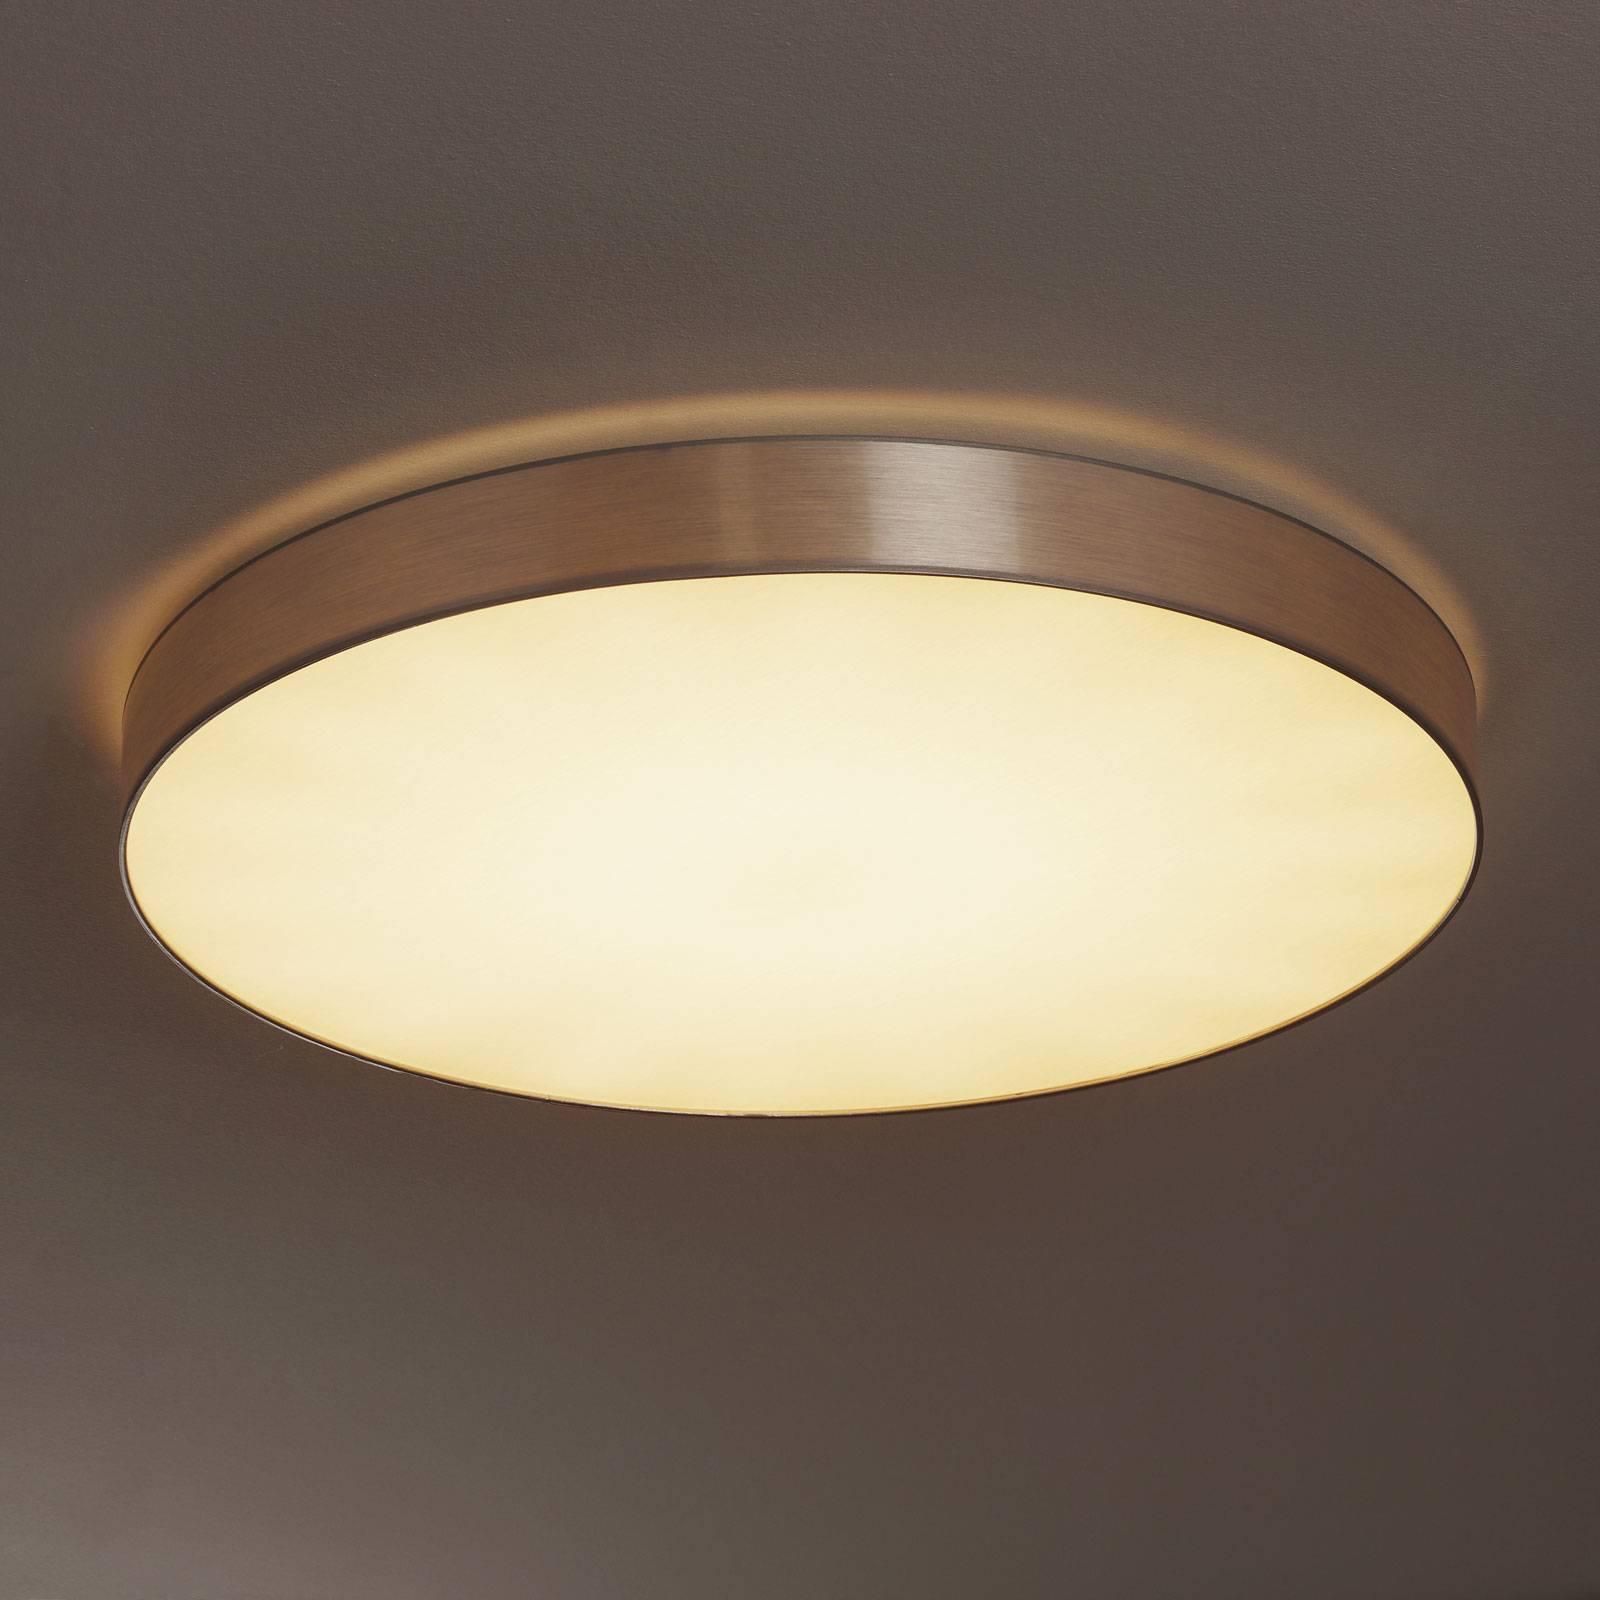 Ronde LED plafondlamp Aurelia met dimfunctie